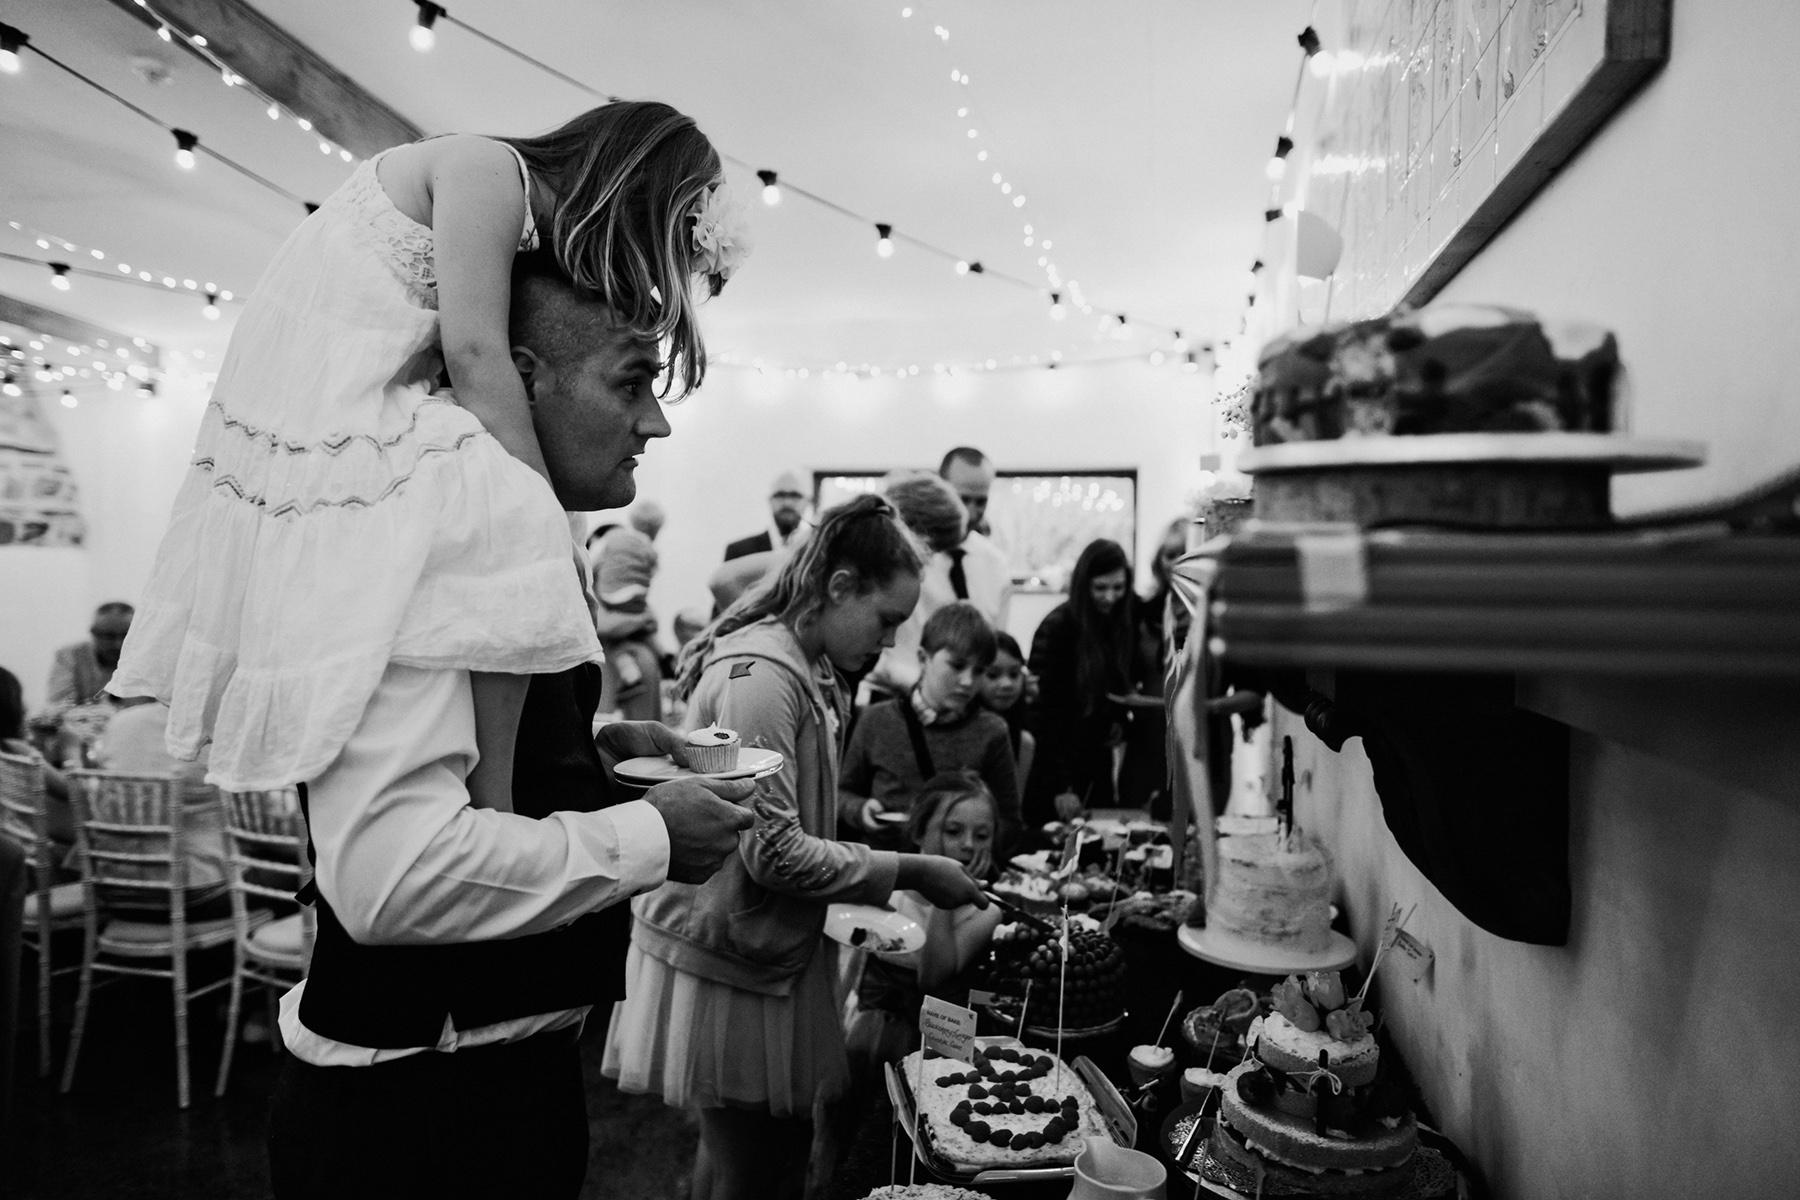 Snowdonia-Wales-Wedding-Photos-0394.jpg